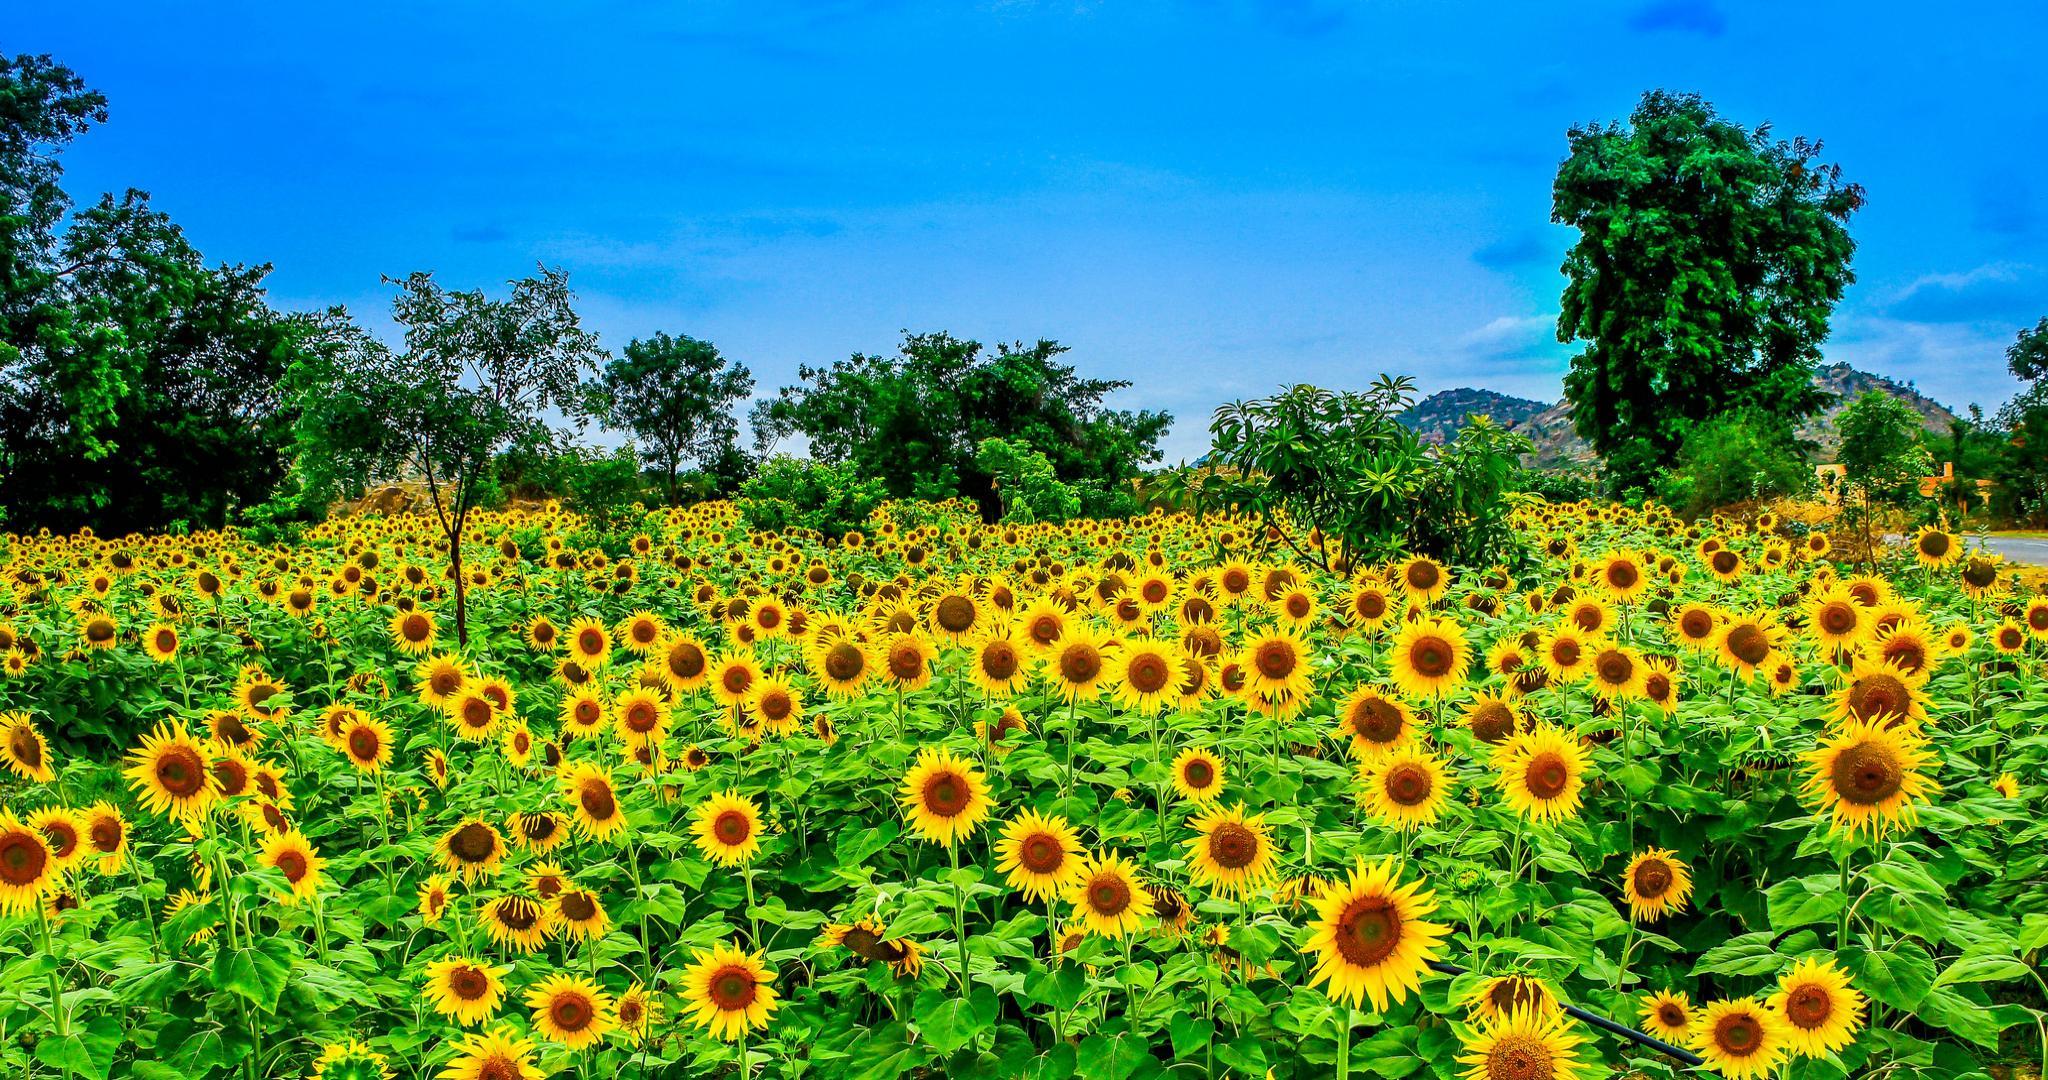 Yellow Flower Wallpapers Hd For Desktop Backgrounds